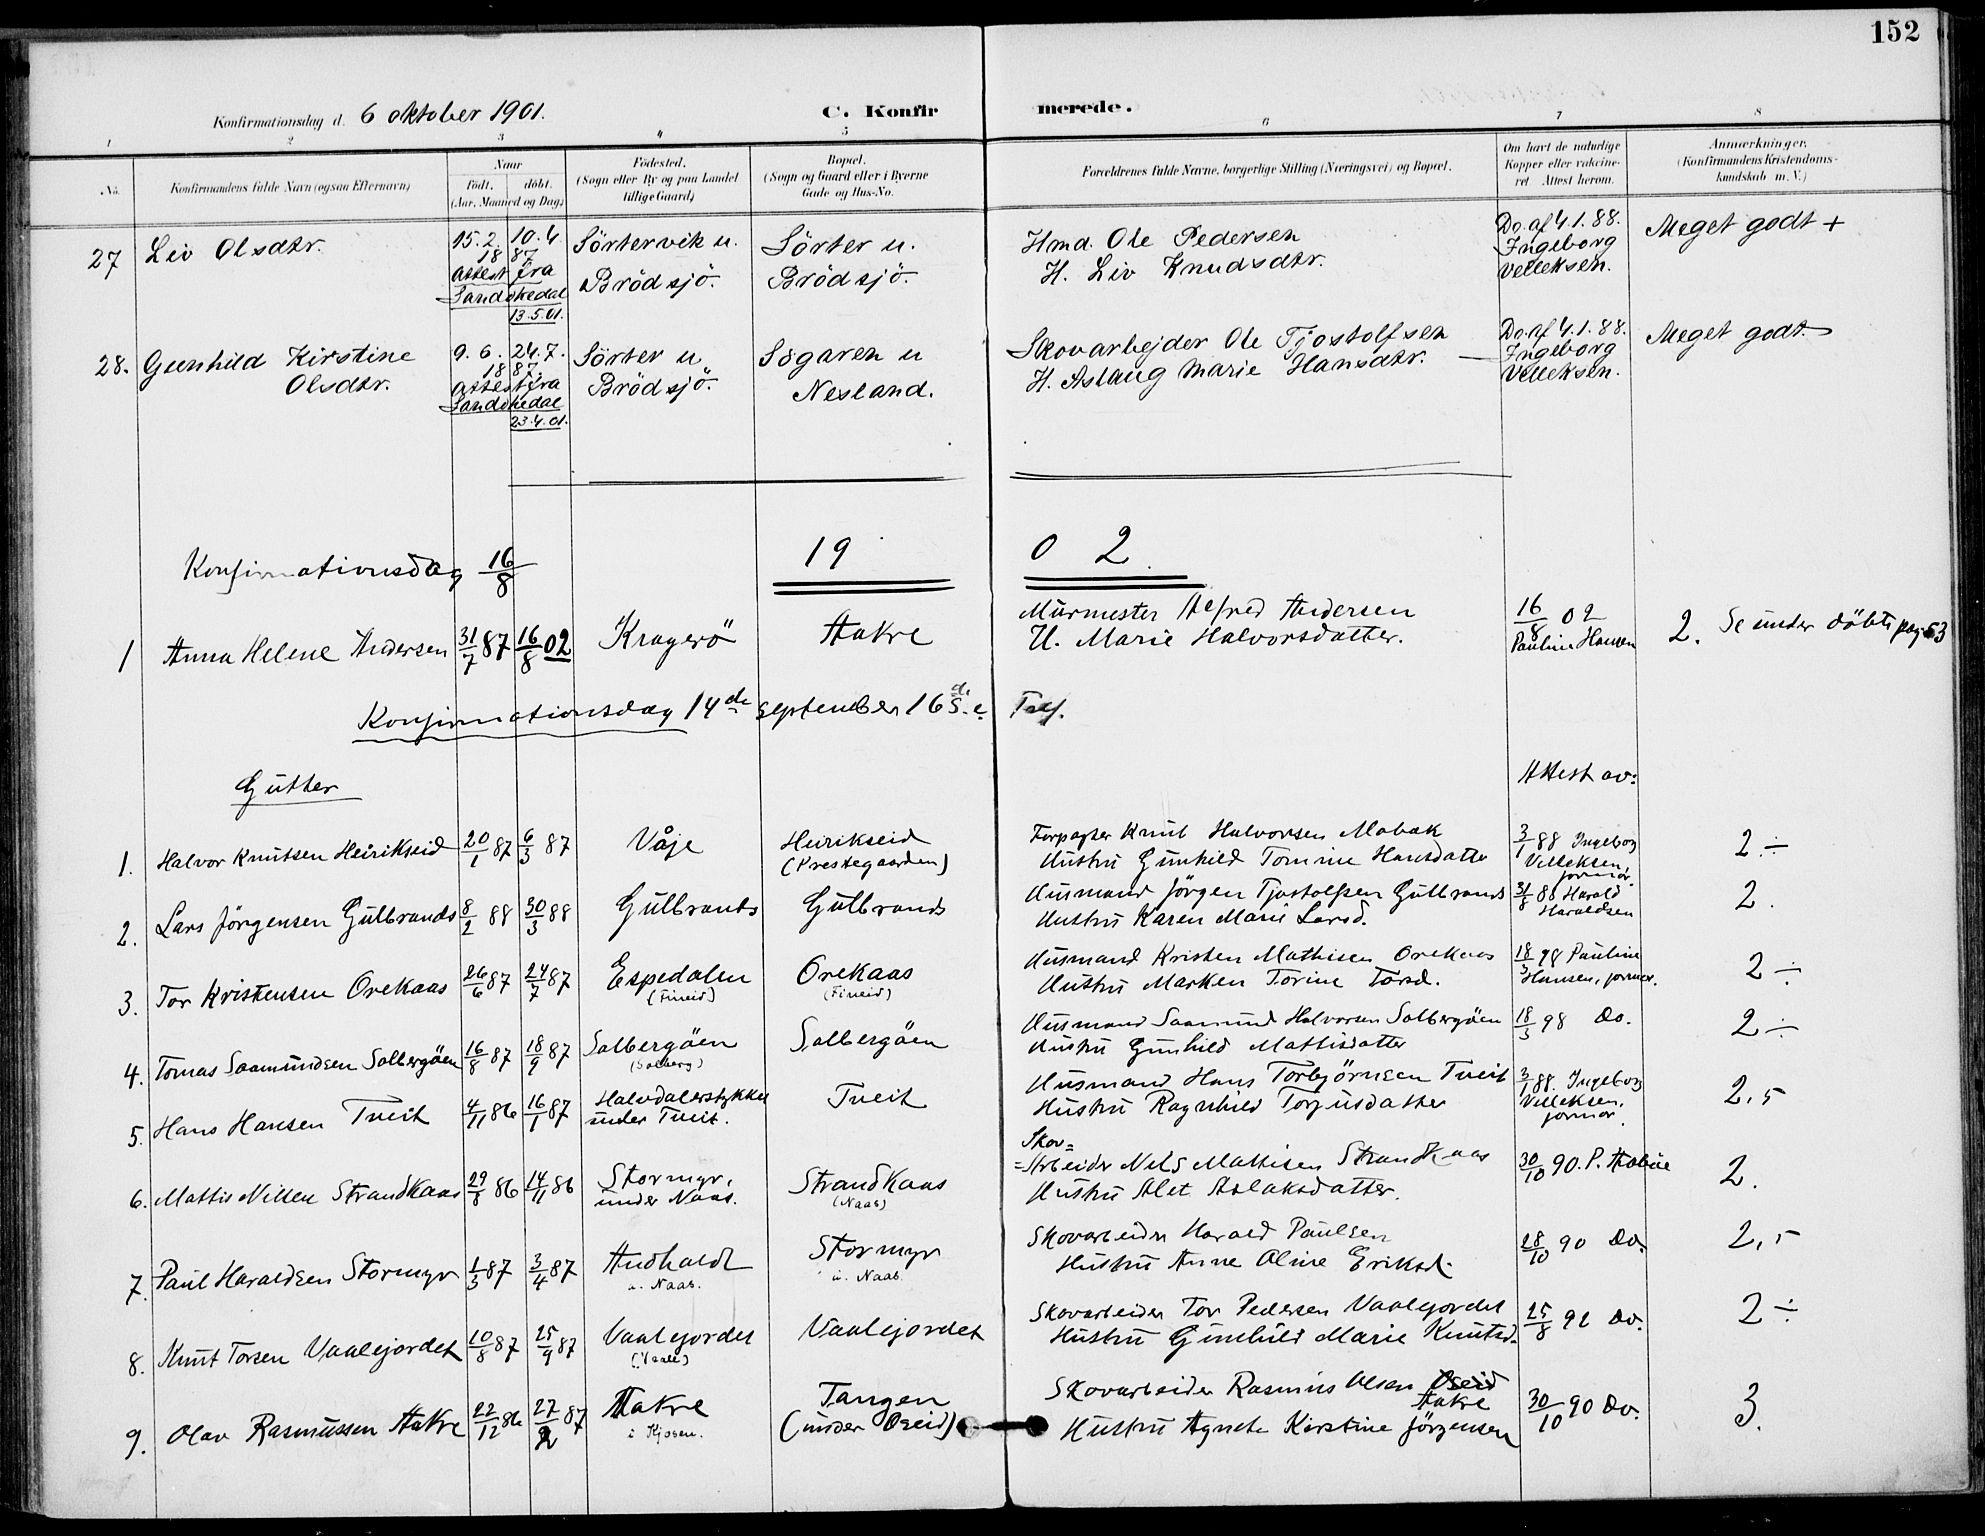 SAKO, Drangedal kirkebøker, F/Fa/L0012: Ministerialbok nr. 12, 1895-1905, s. 152